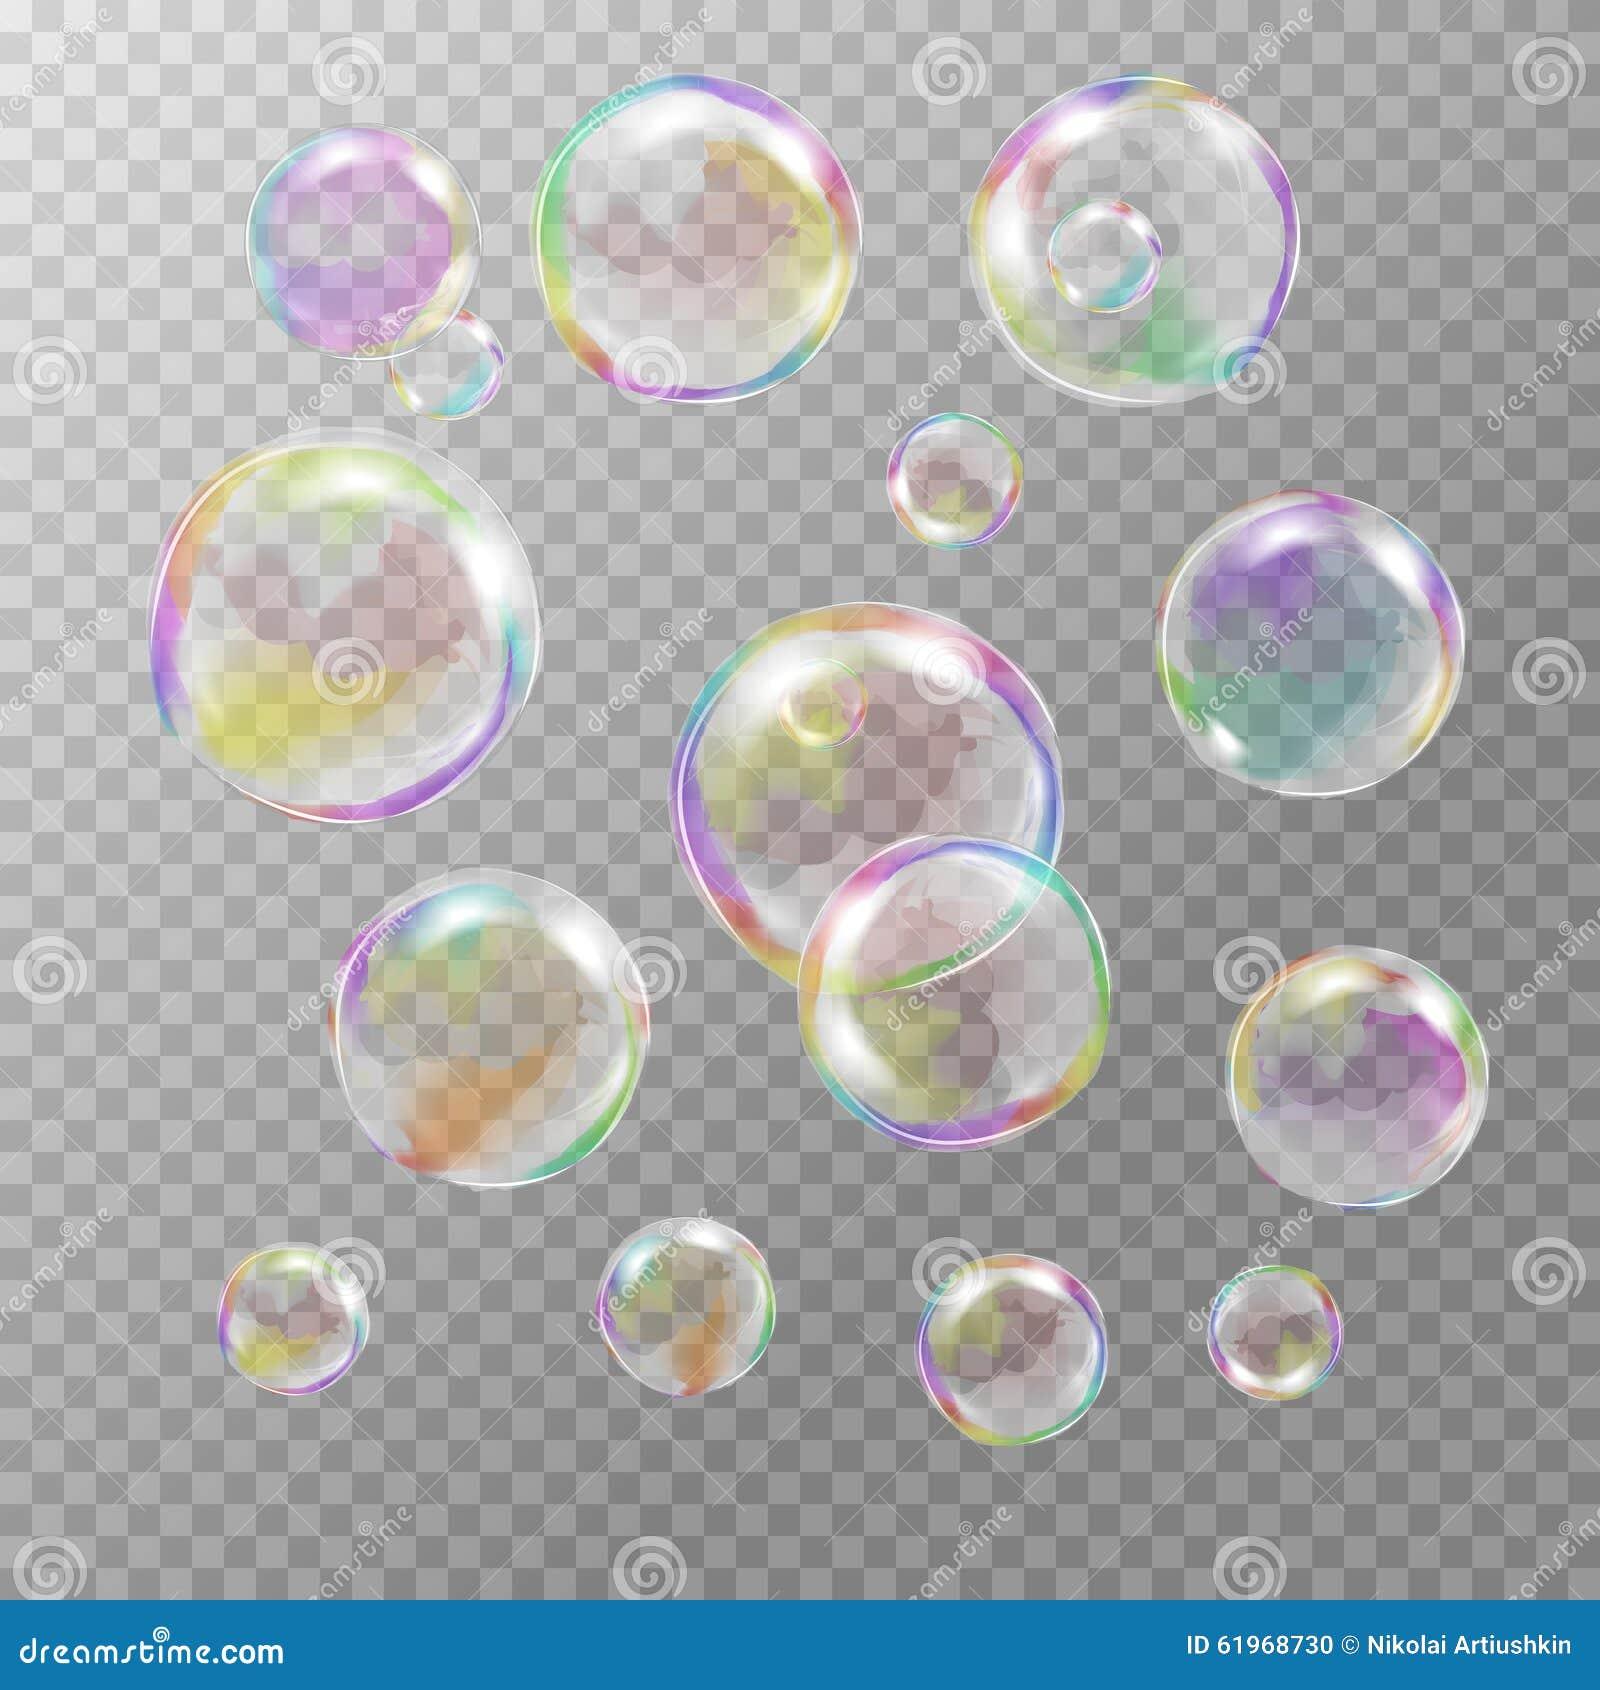 how to draw cartoon soap bubbles